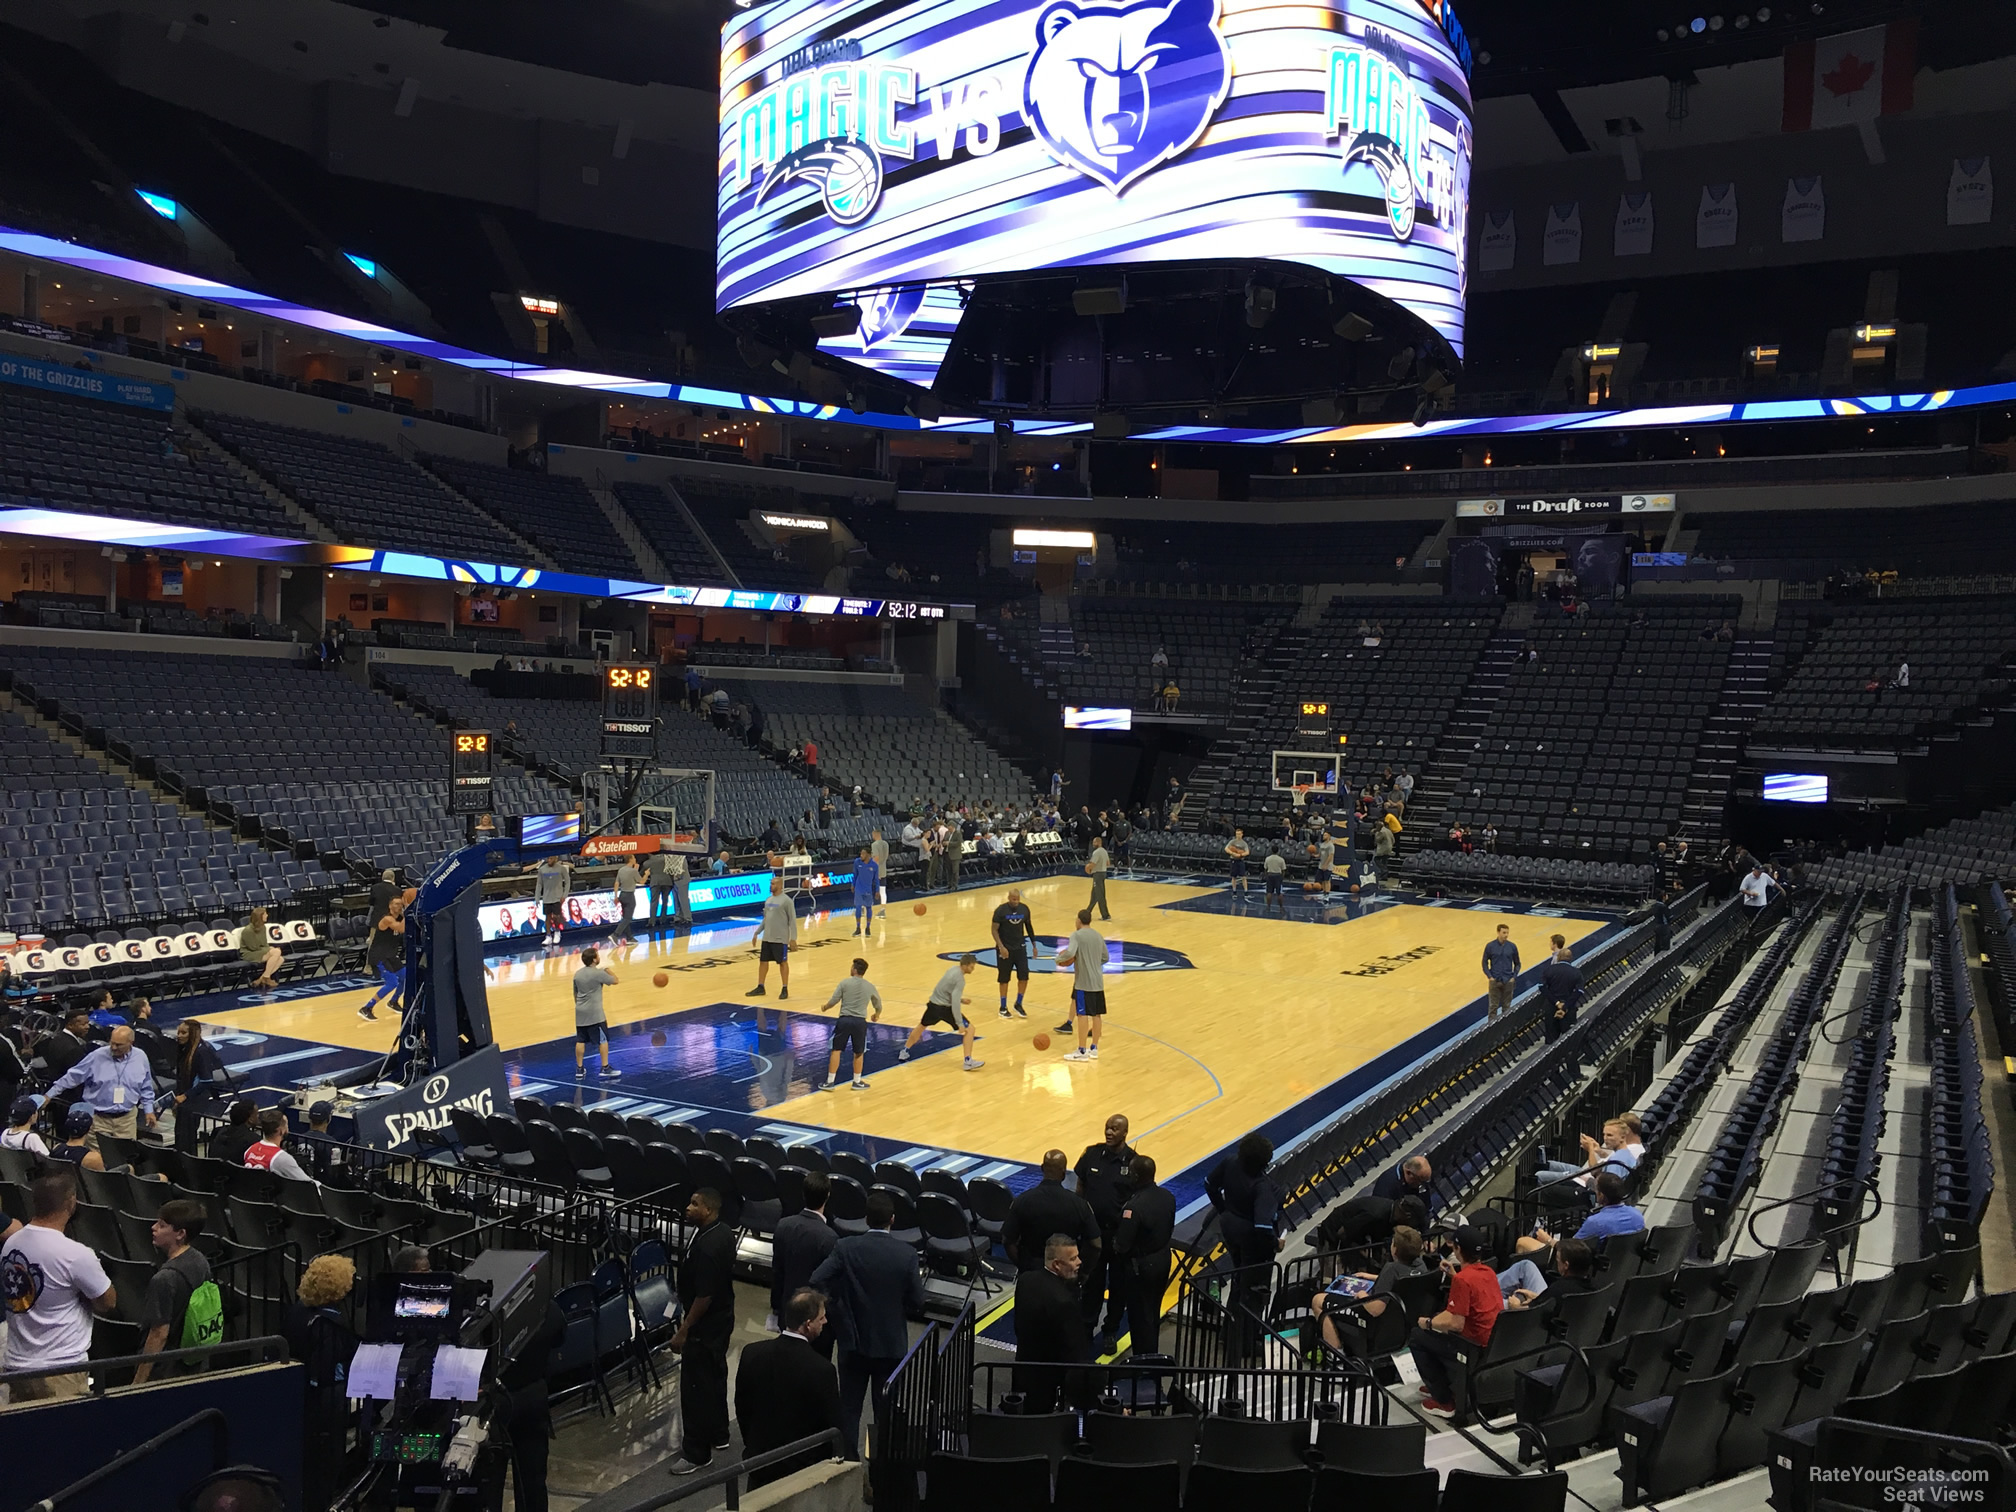 Memphis Grizzlies Stadium Seating Chart Wallseat Co